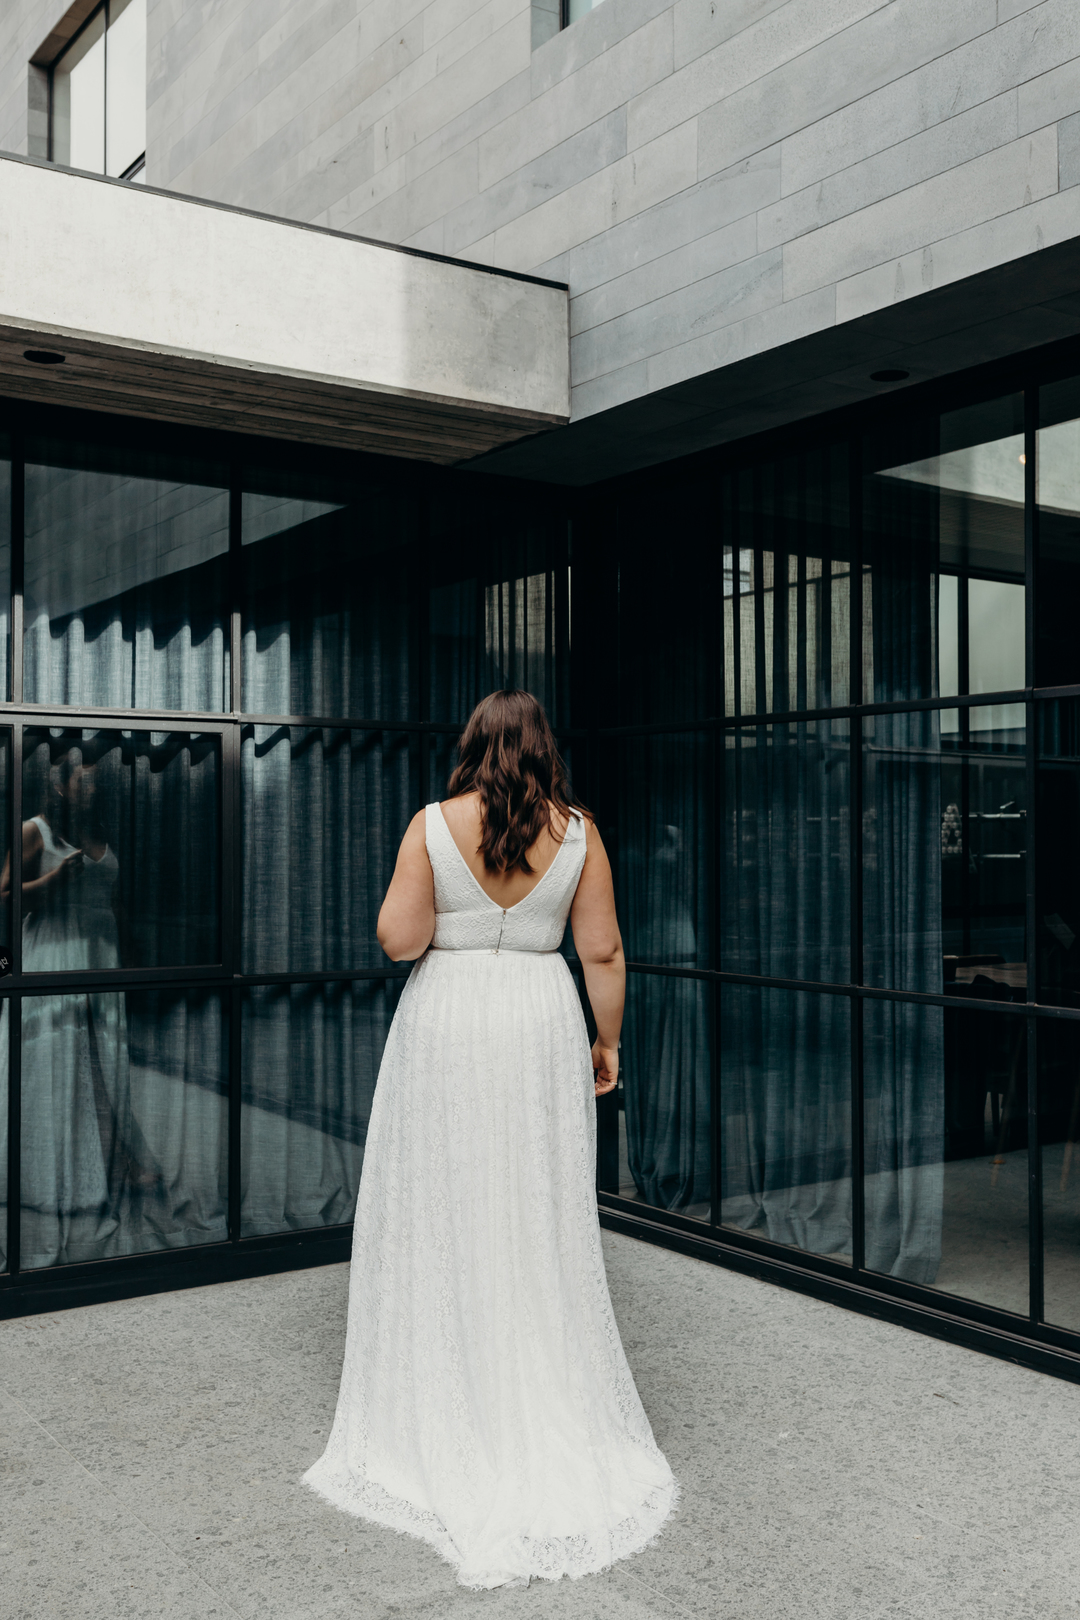 nadia dress photo